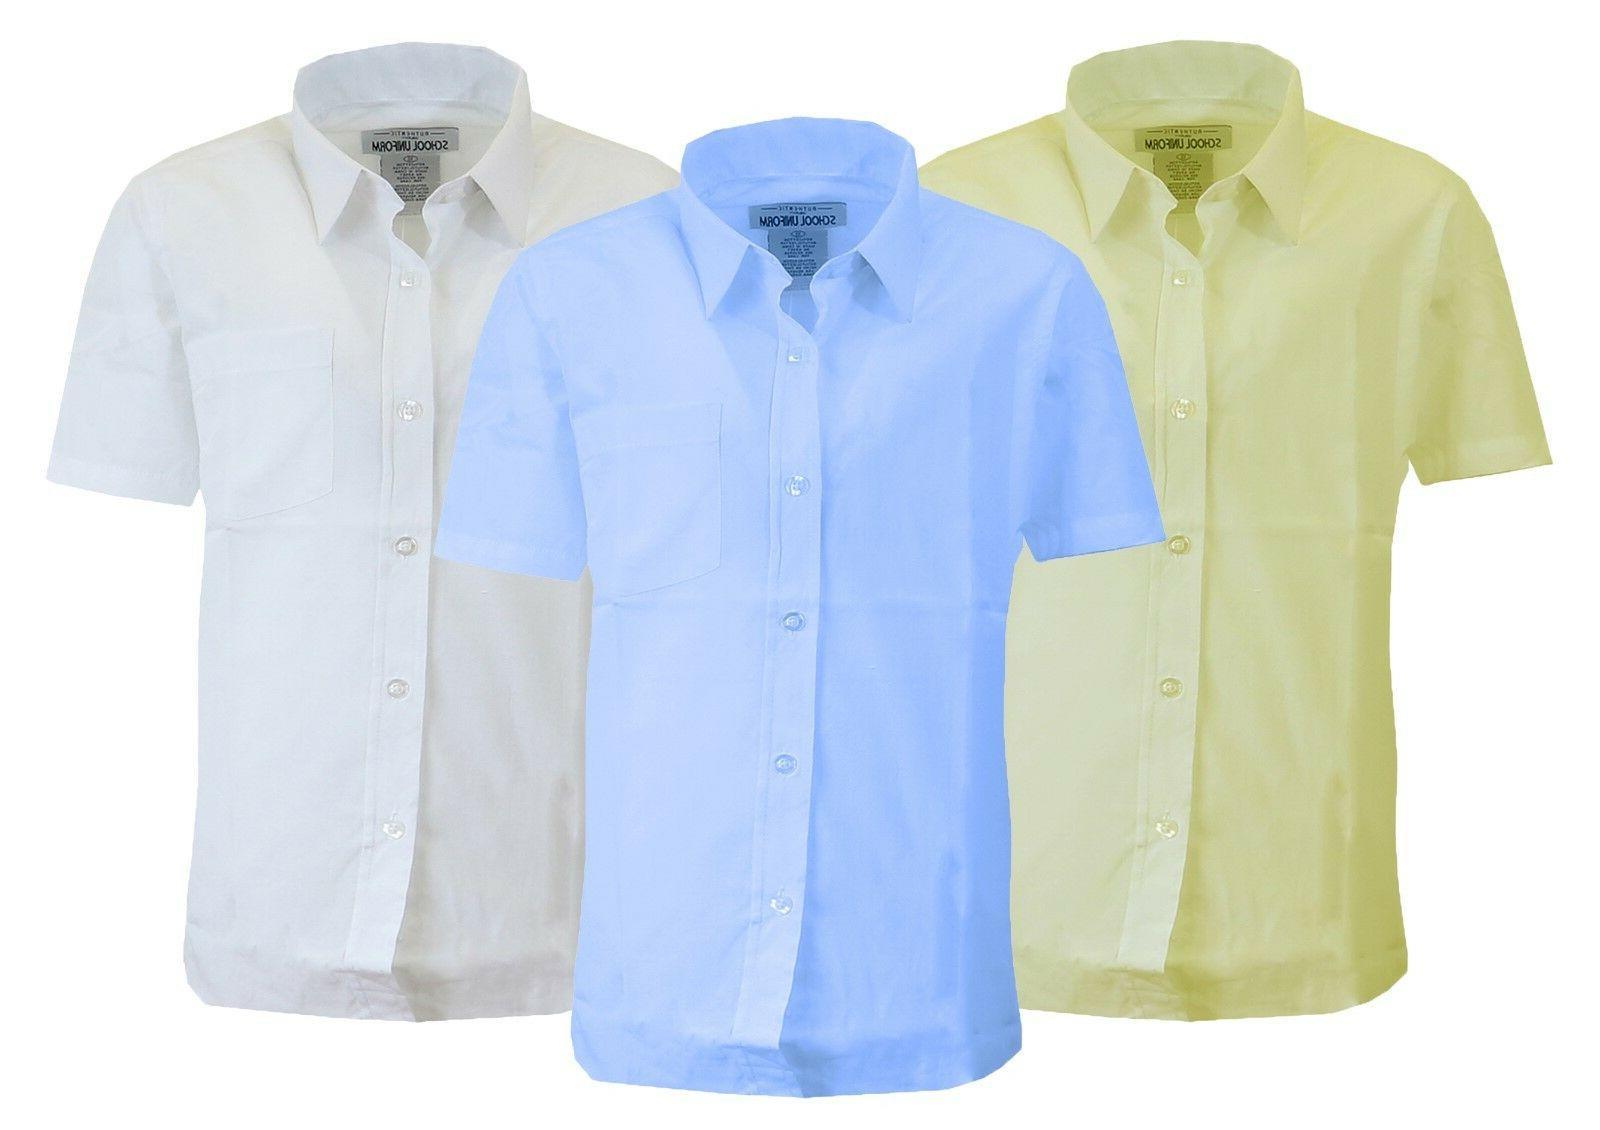 Boys Short Sleeve Dress Shirts Uniform School Casual Classic